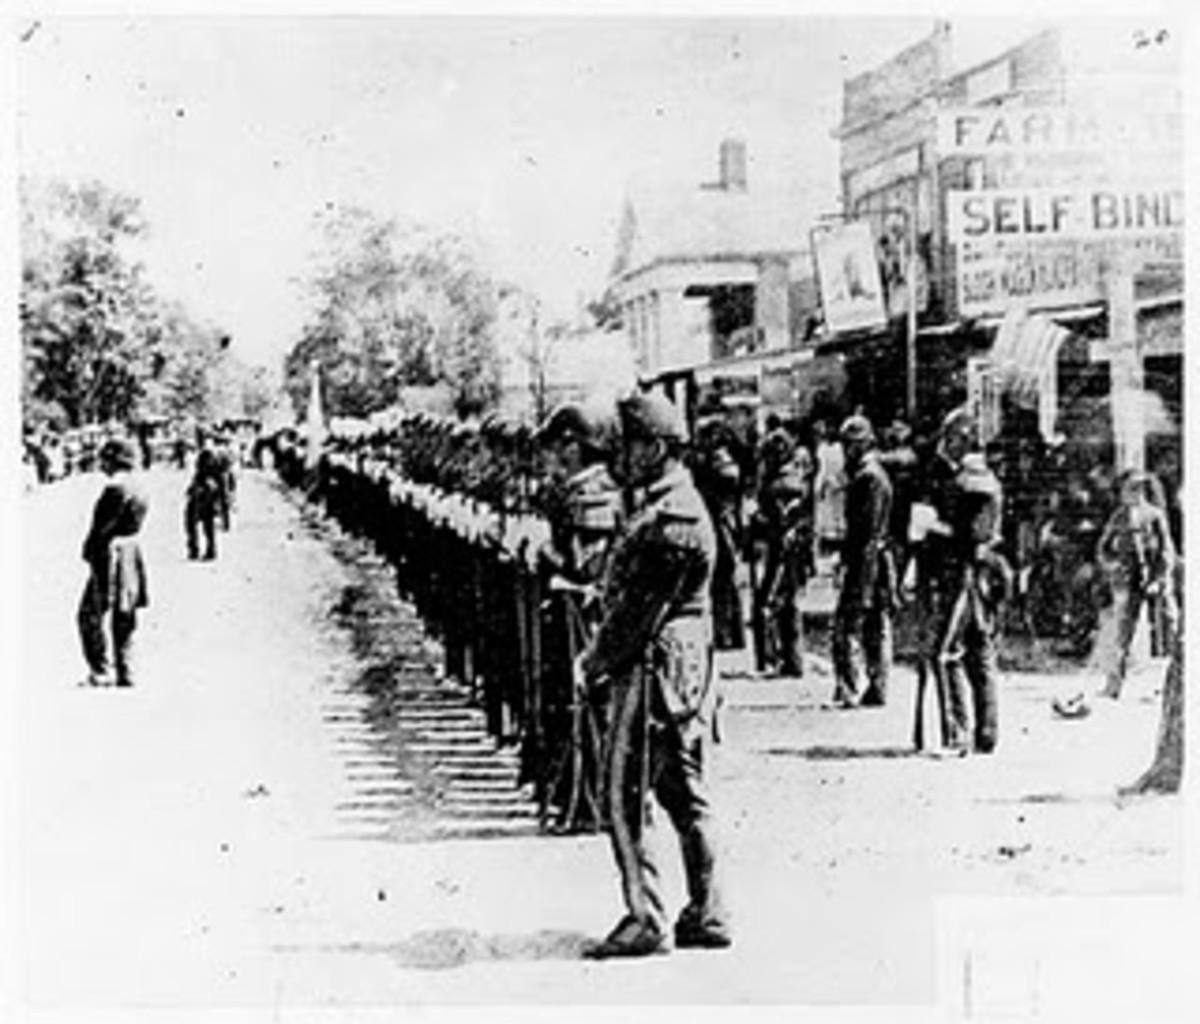 A Volunteer Regiment rests while on parade